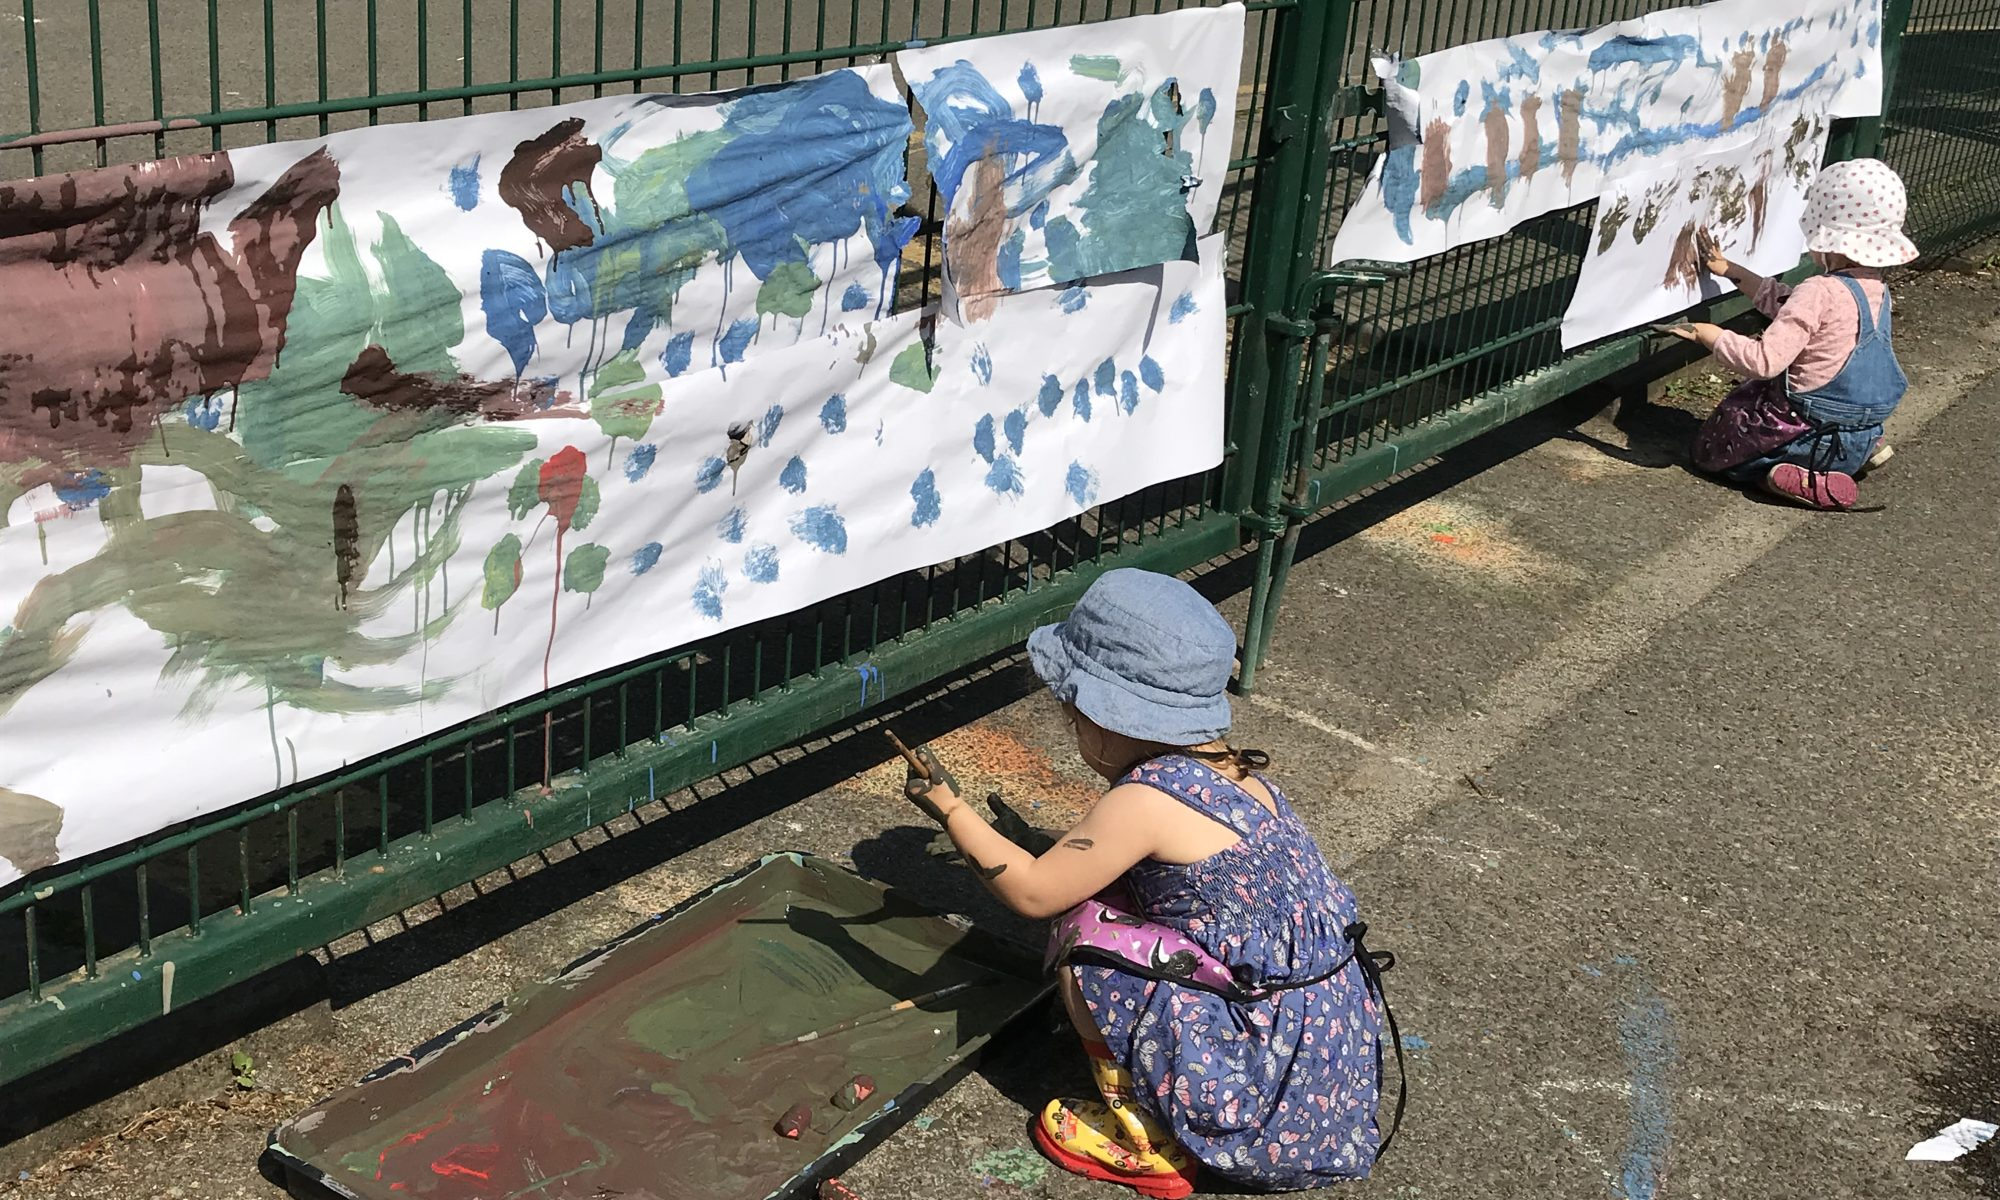 Unity Montessori Nursery School